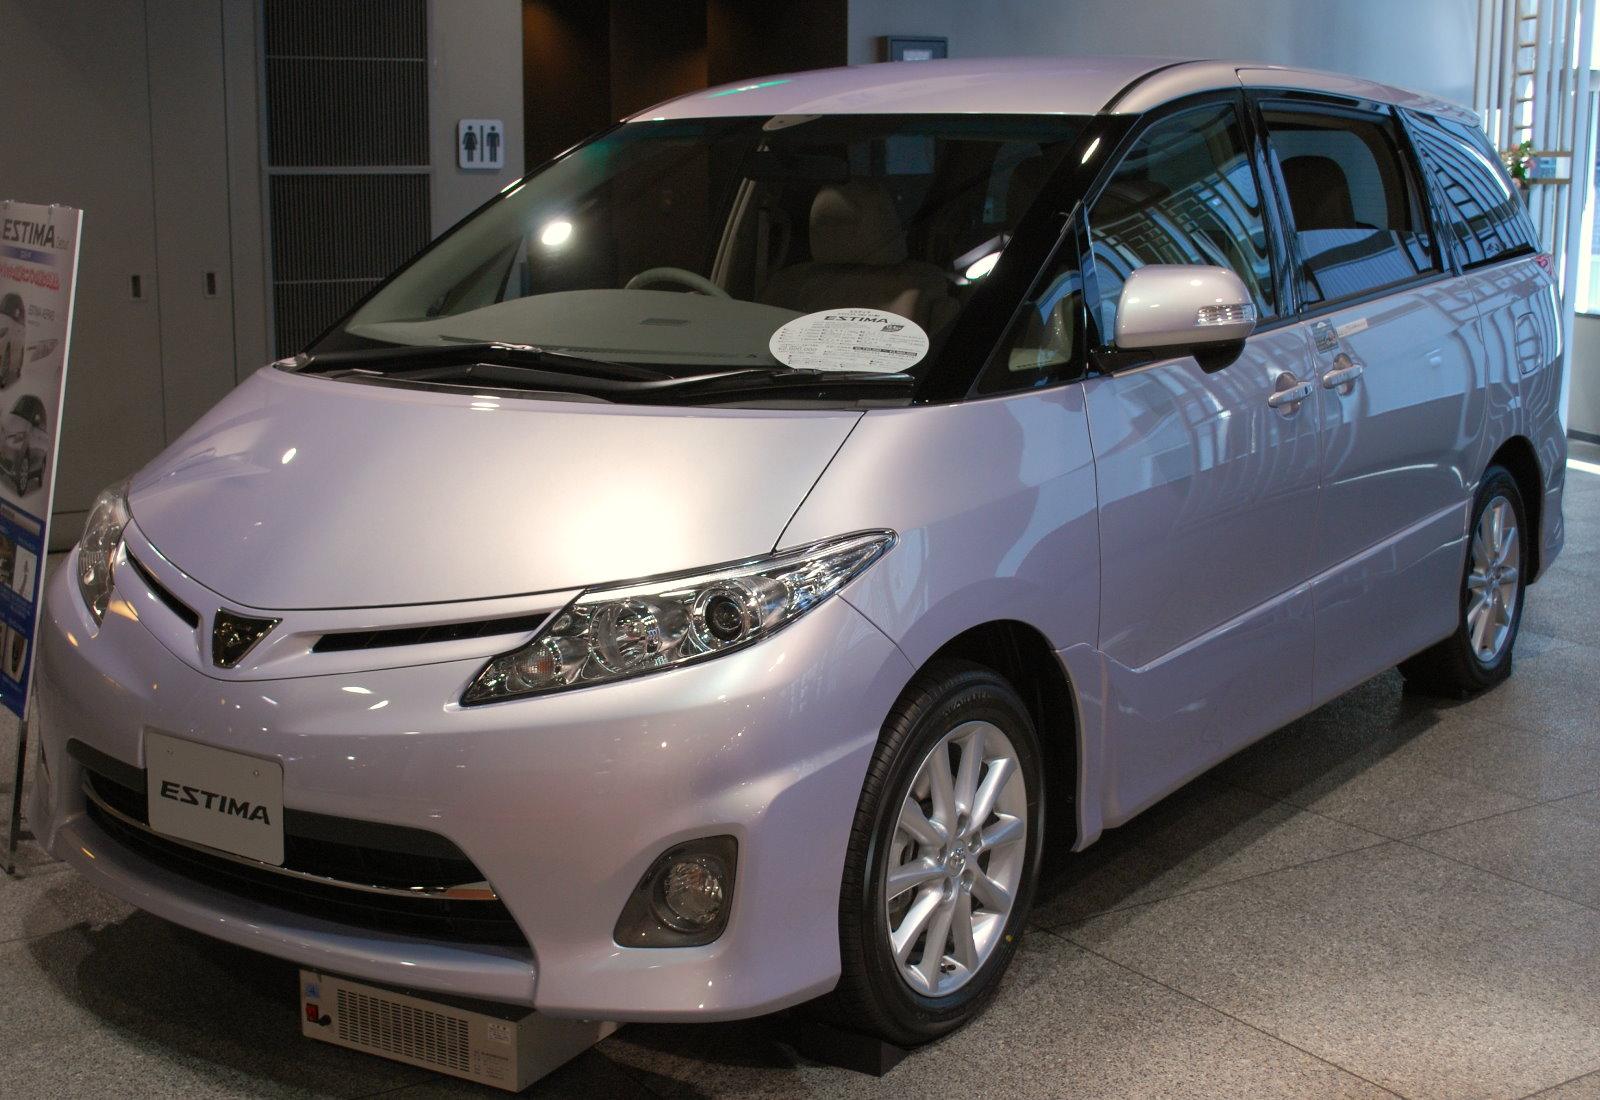 File:2008 Toyota Estima 01.jpg - Wikimedia Commons